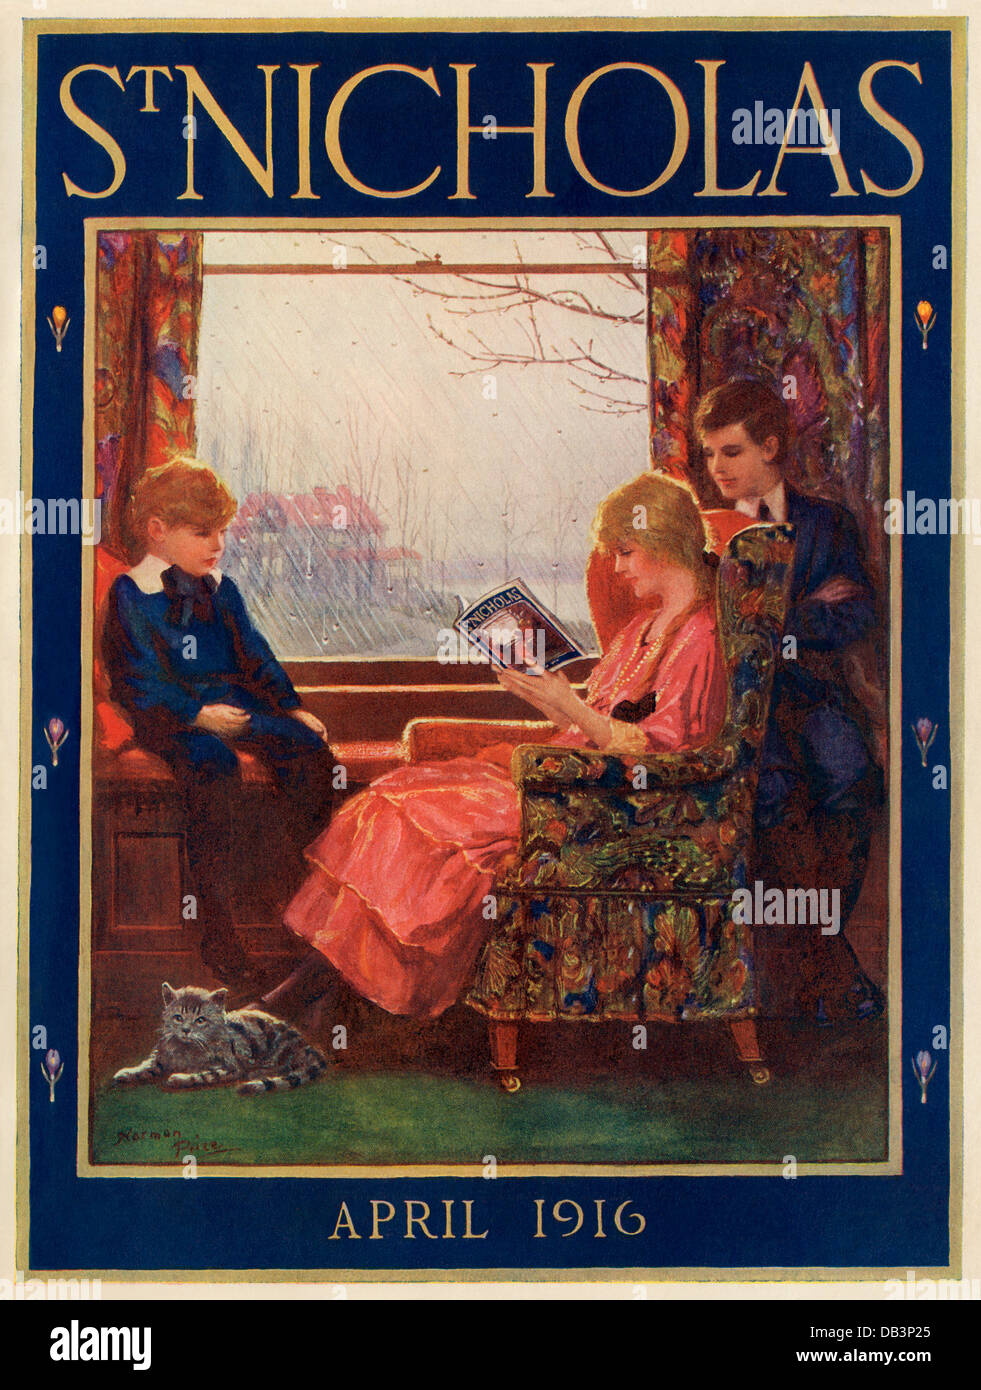 St Nicholas Magazine cover, April 1916. Color halftone illustration - Stock Image